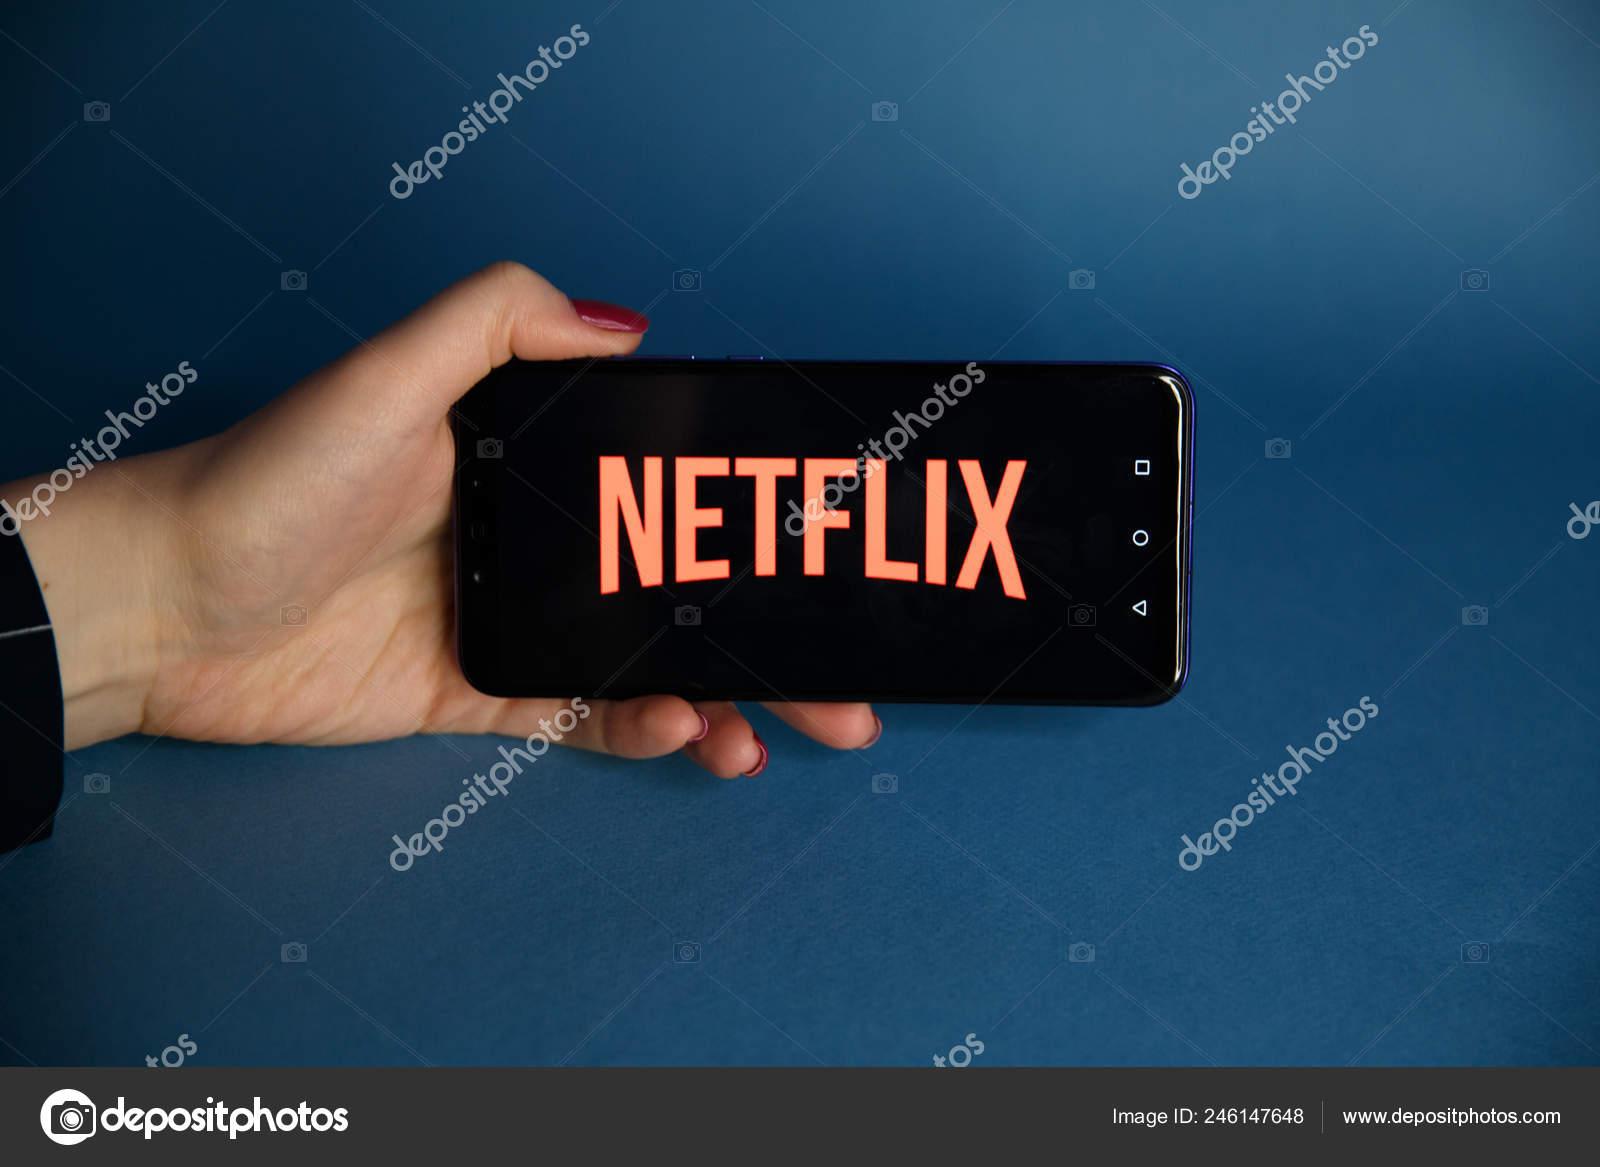 Tula, Russia - JANUARY 29, 2019: Close up Netflix app icon